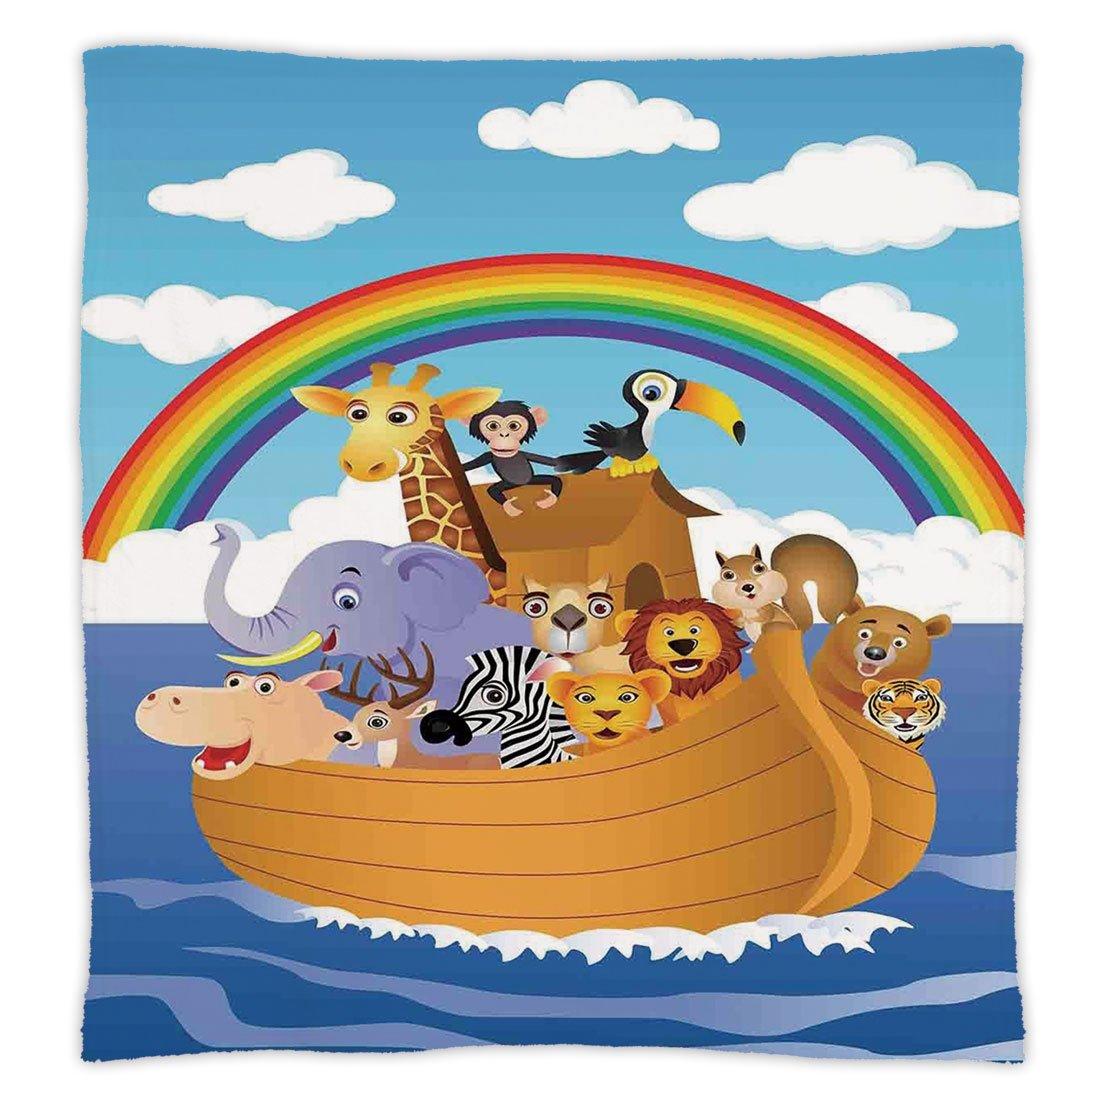 Super Soft Throw Blanket Custom Design Cozy Fleece Blanket,Noahs Ark,Cartoon Style Group of Animals in Noahs Ark Childish Cheering Design Artwork,Multicolor,Perfect for Couch Sofa or Bed